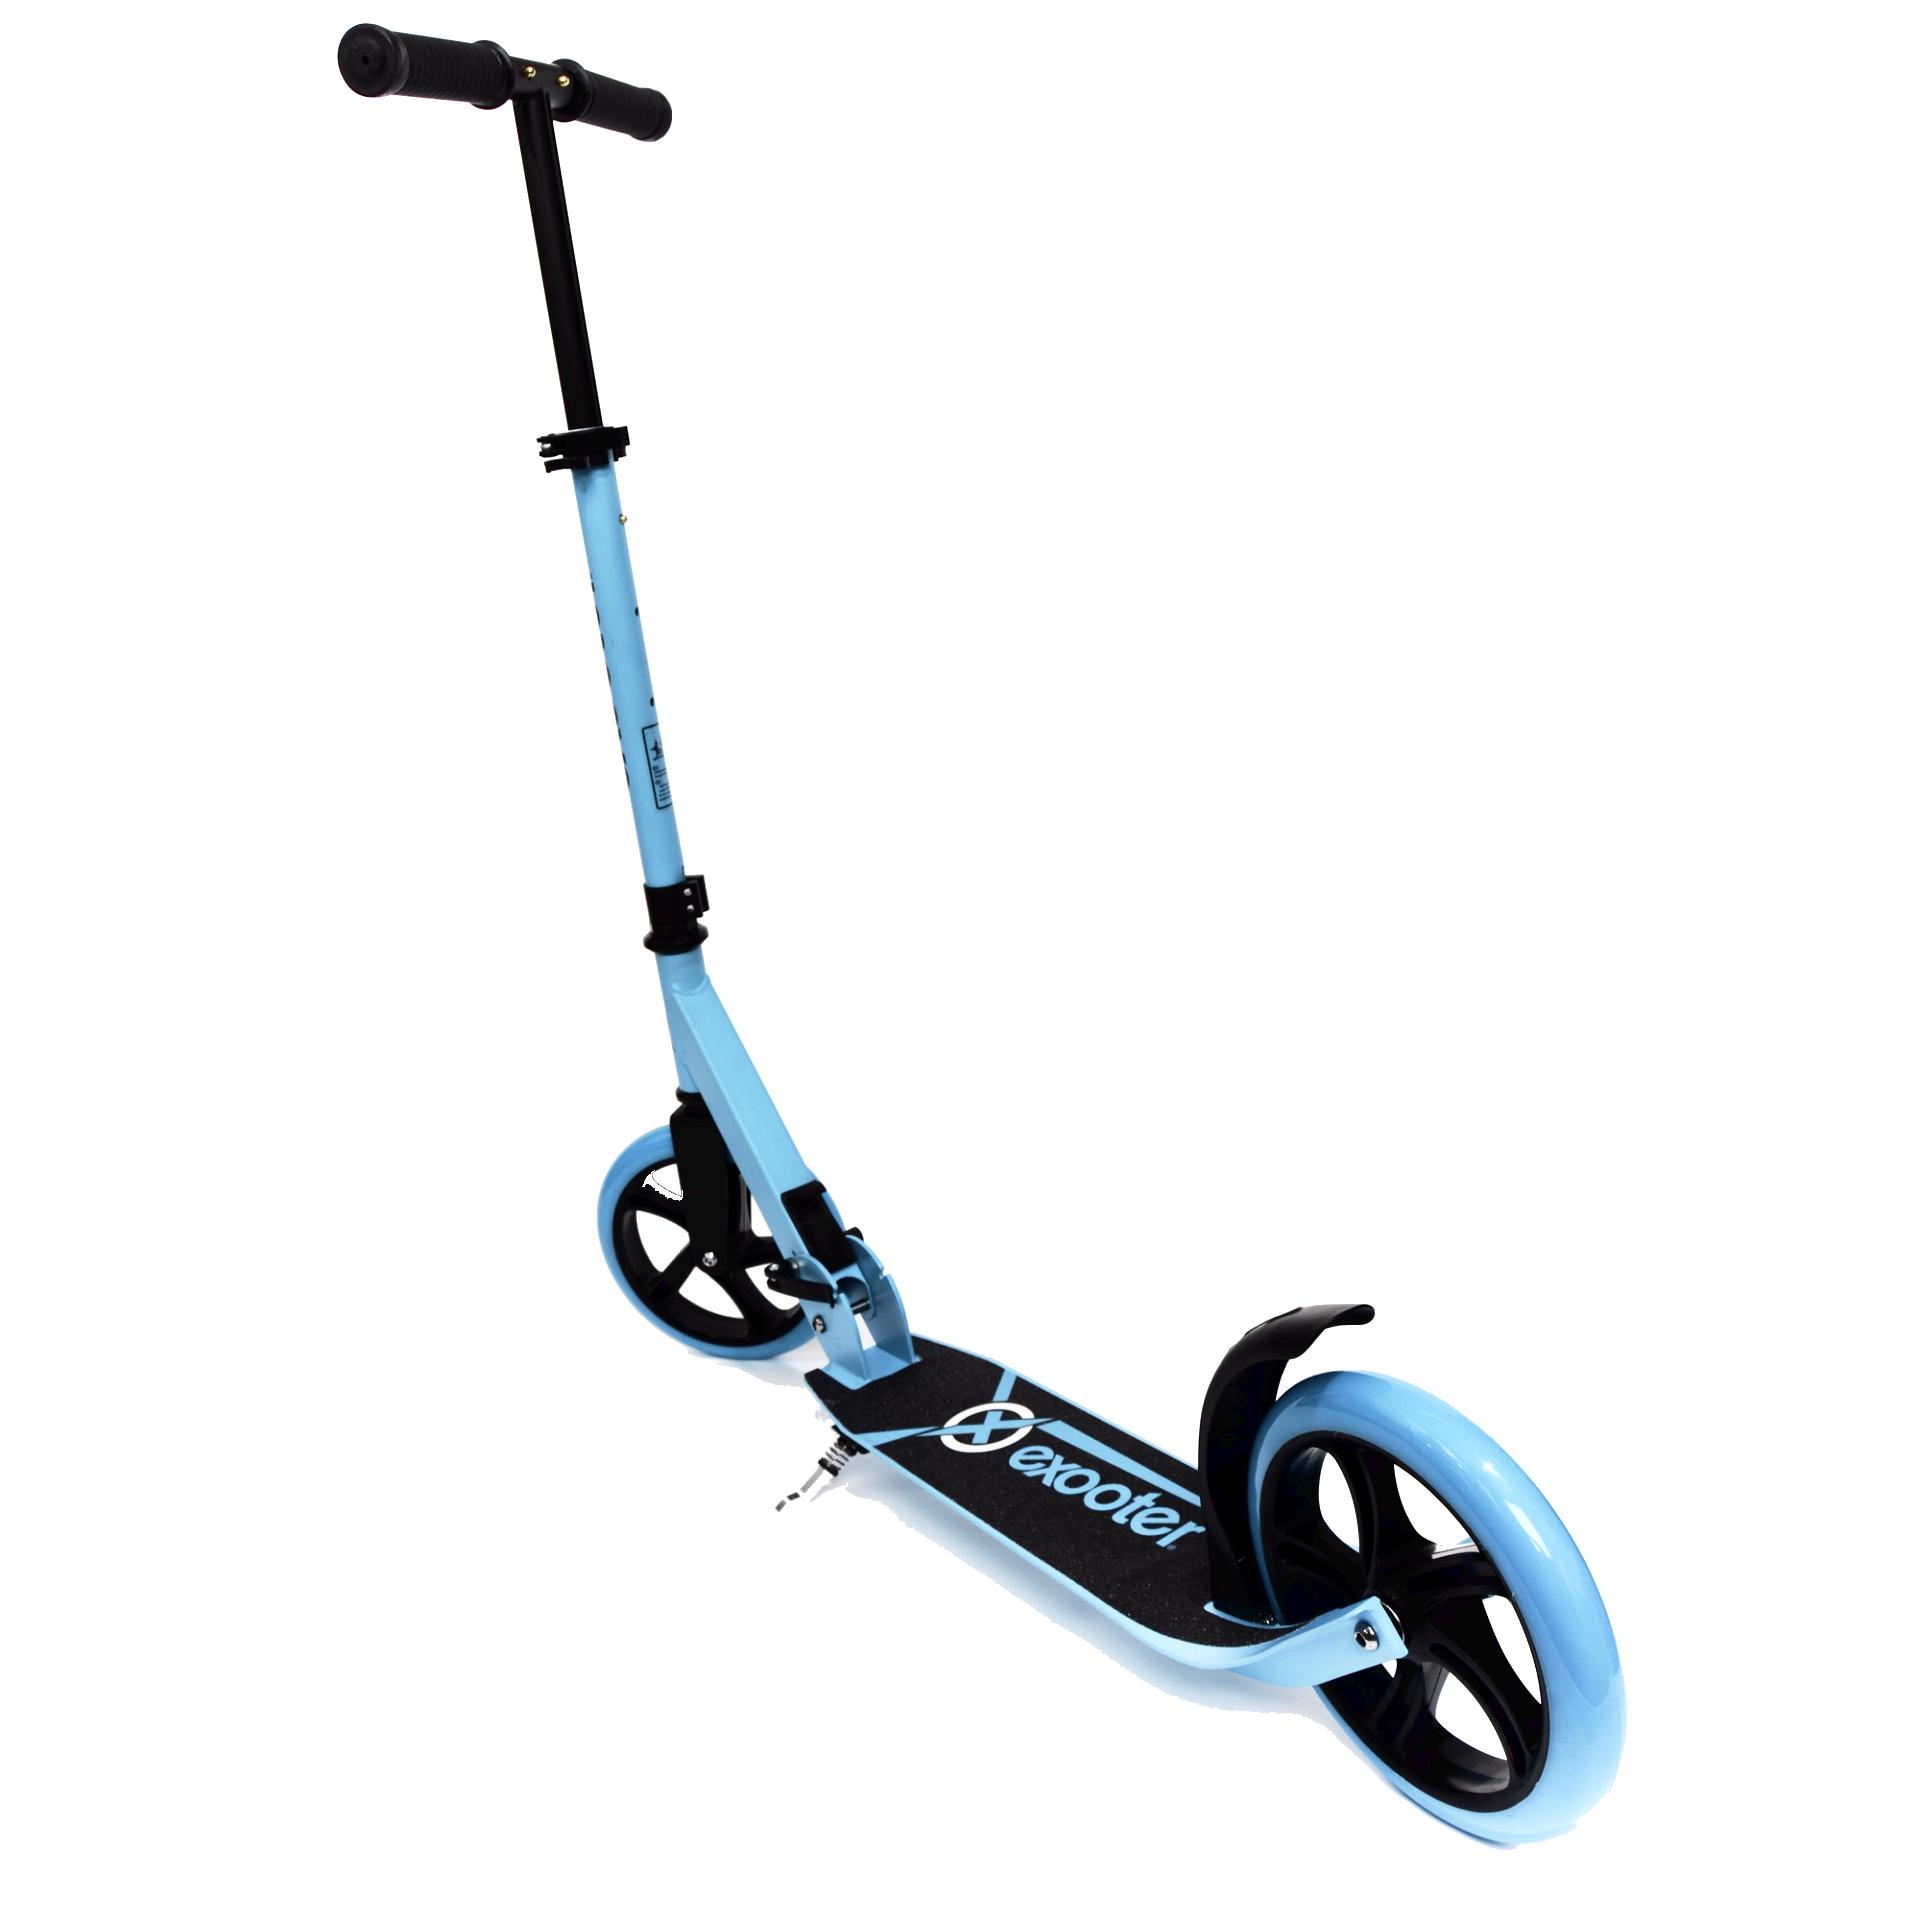 Scooter clipart transparent. Kick png mart